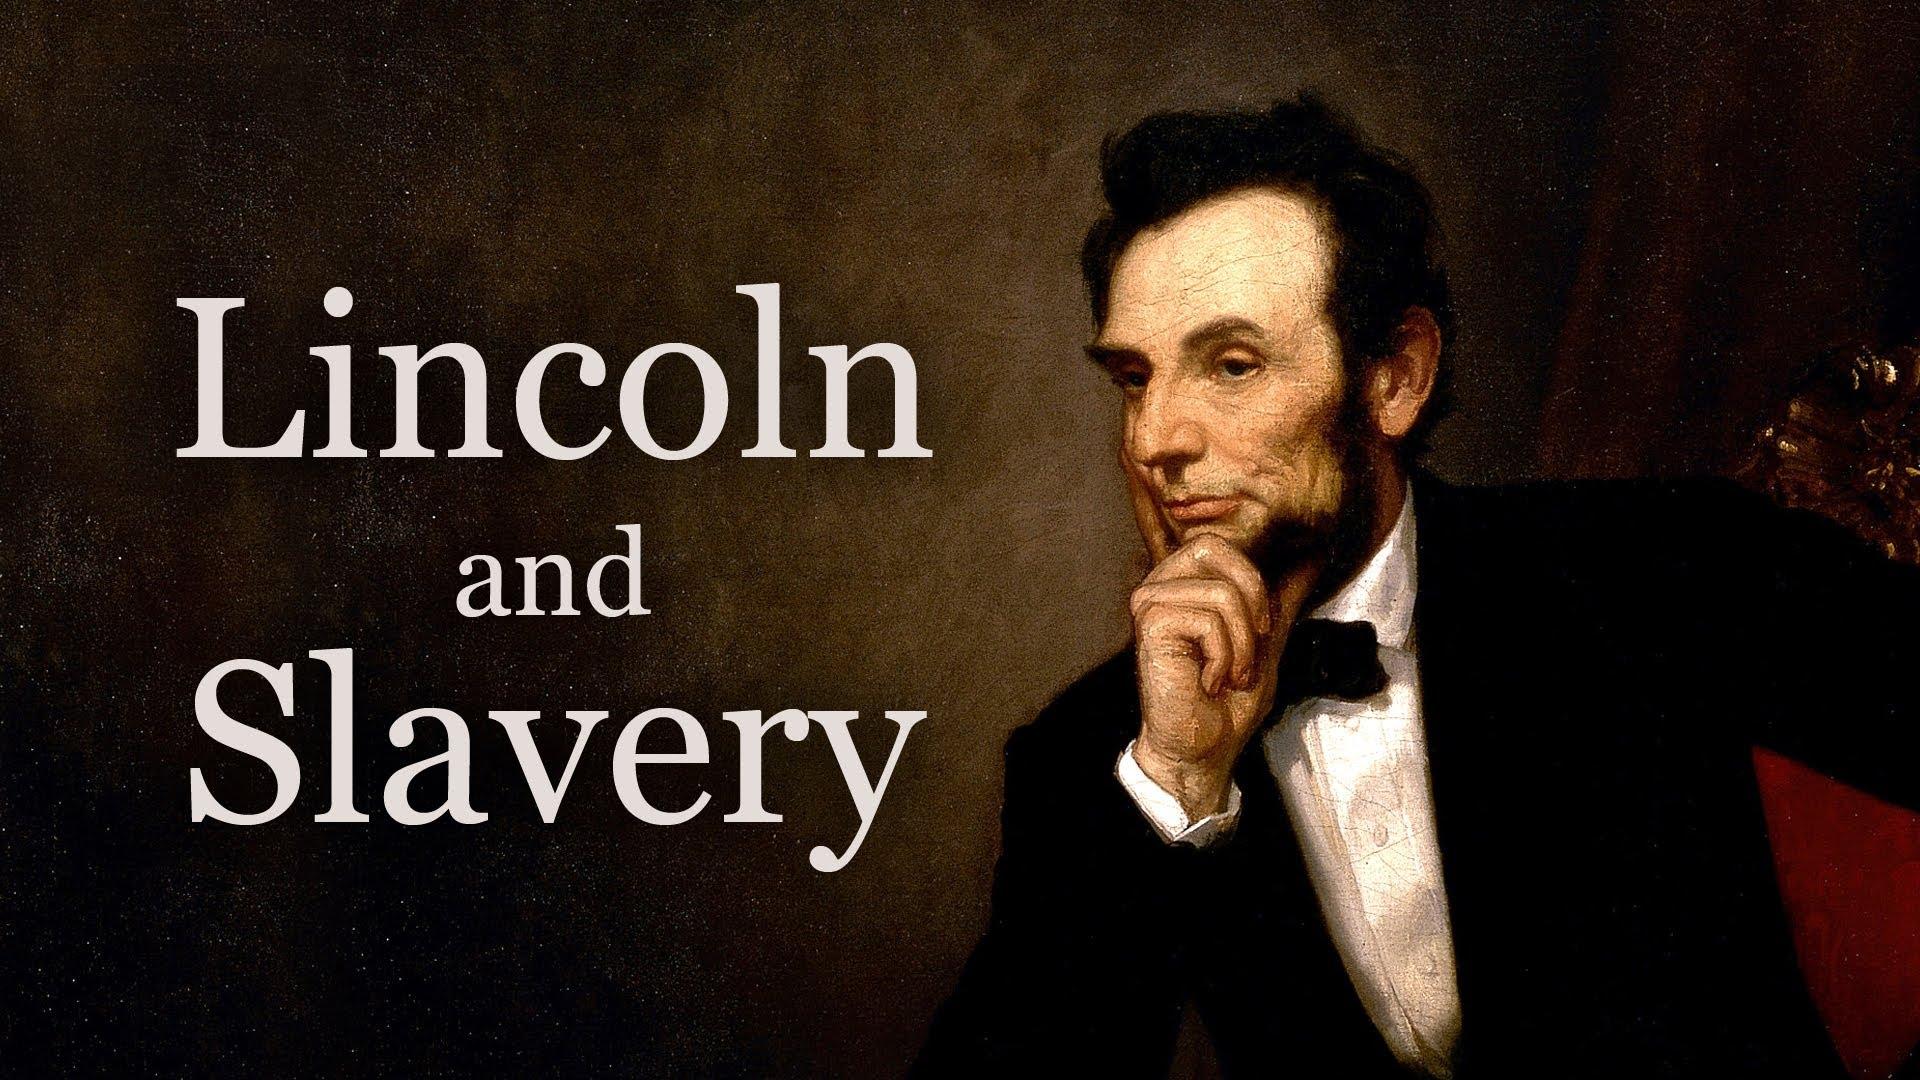 Abraham Lincoln - Views on Slavery